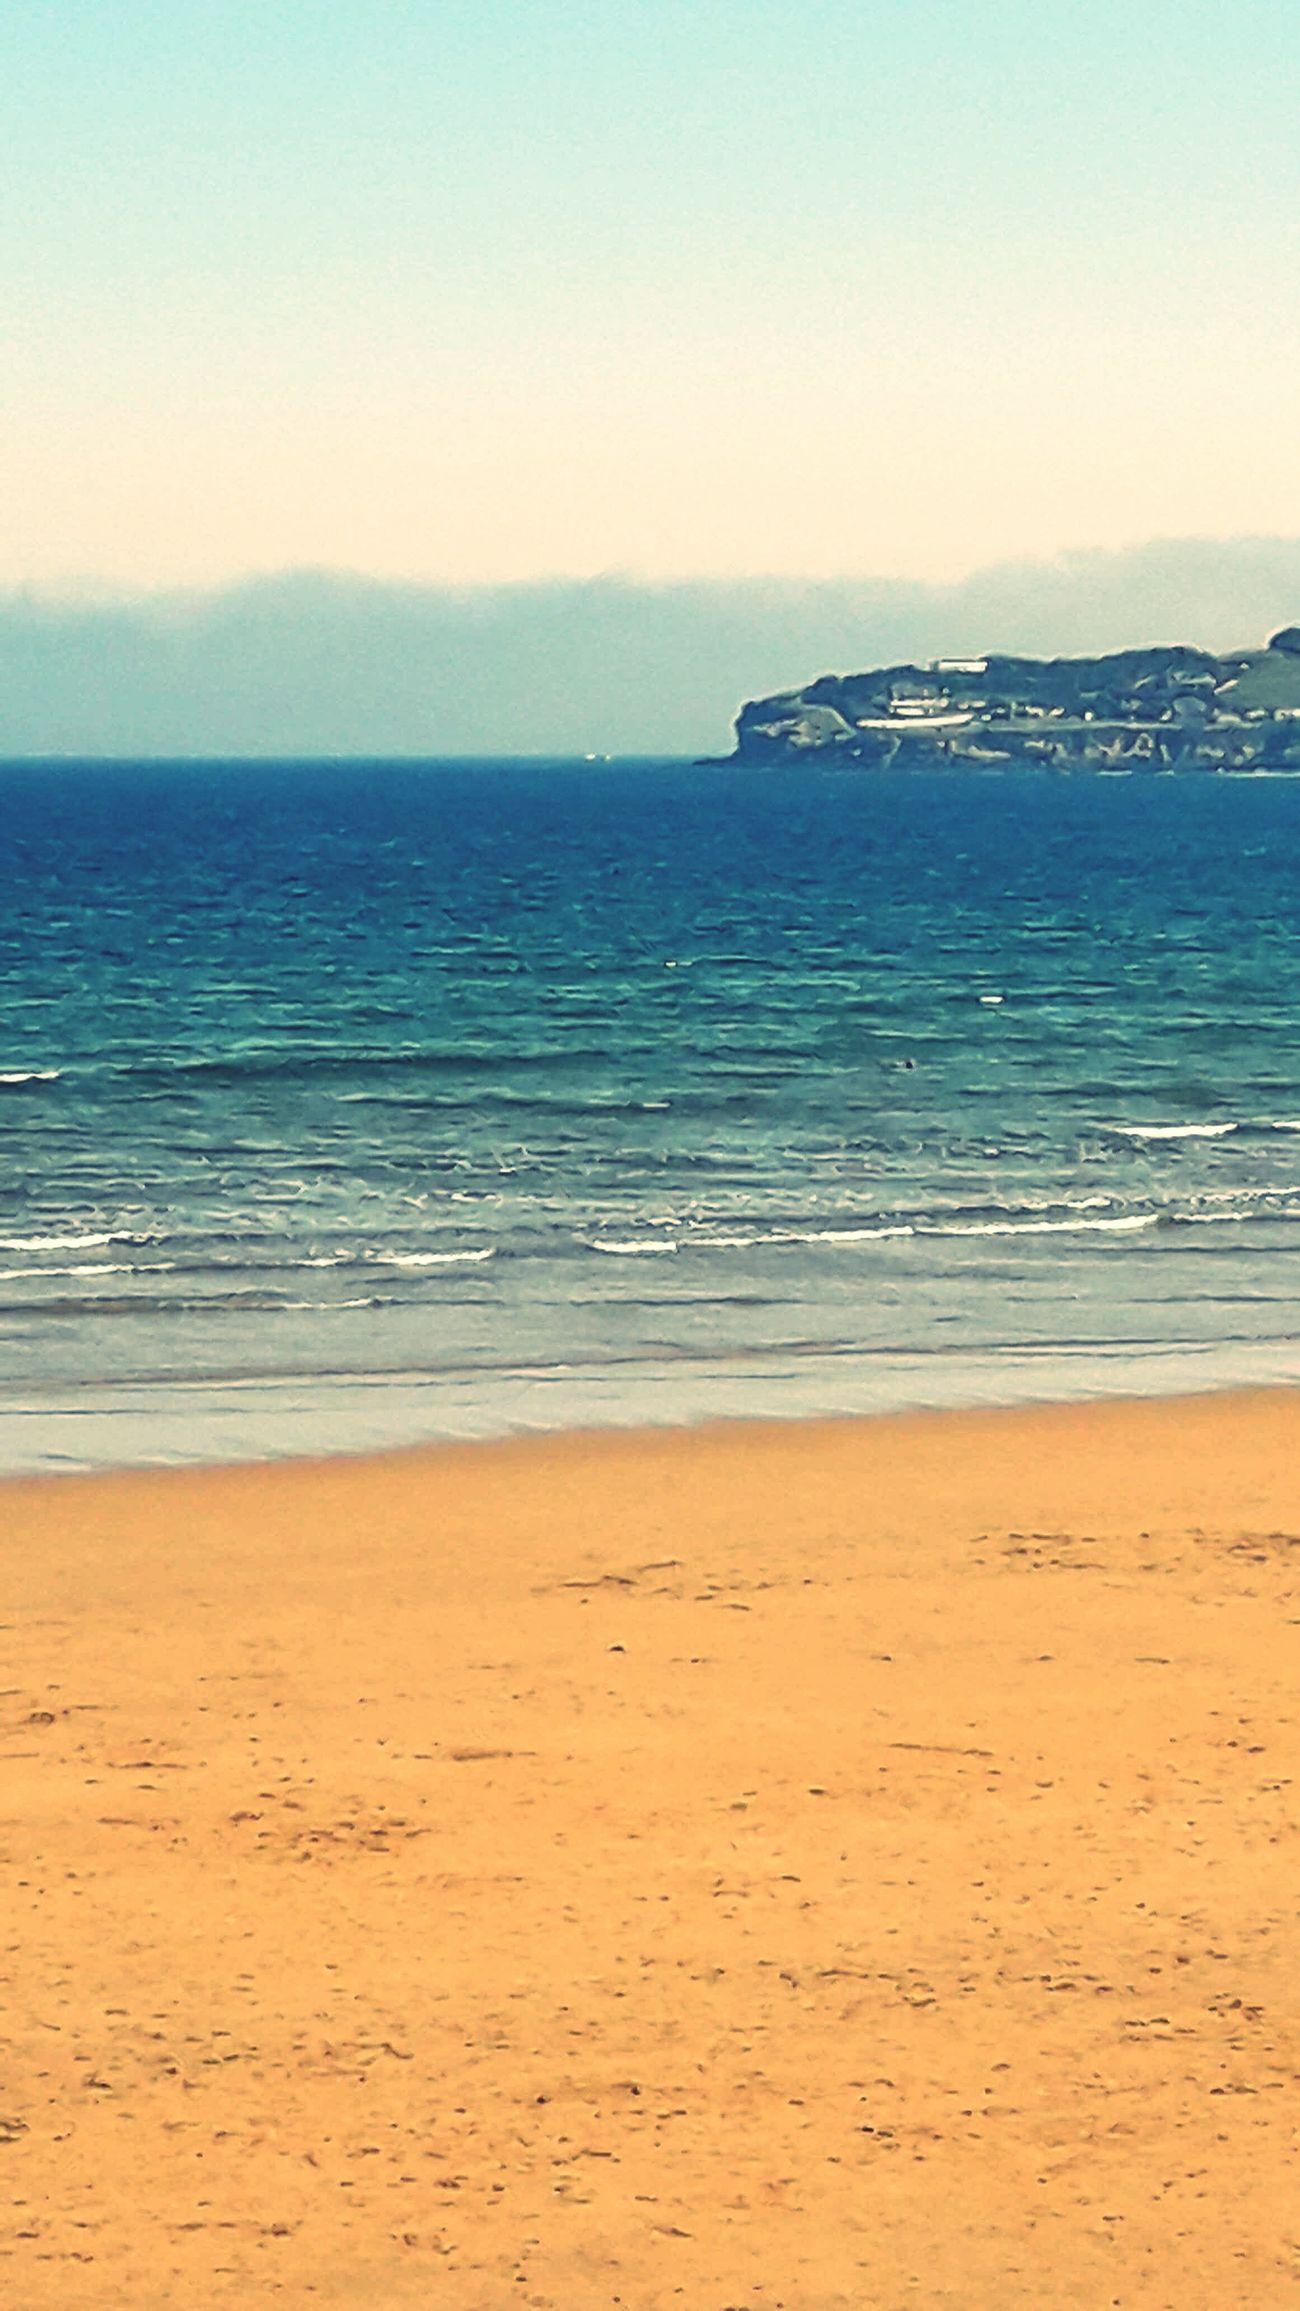 Playadesanlorenzo Sea Beach Nature Spain_beautiful_landscapes Españainstagram Enjoying The Sun Beachphotography Gijon_gallery Asturias Photography Asturias_ig Asturiasparaisonatural Water Tranquility